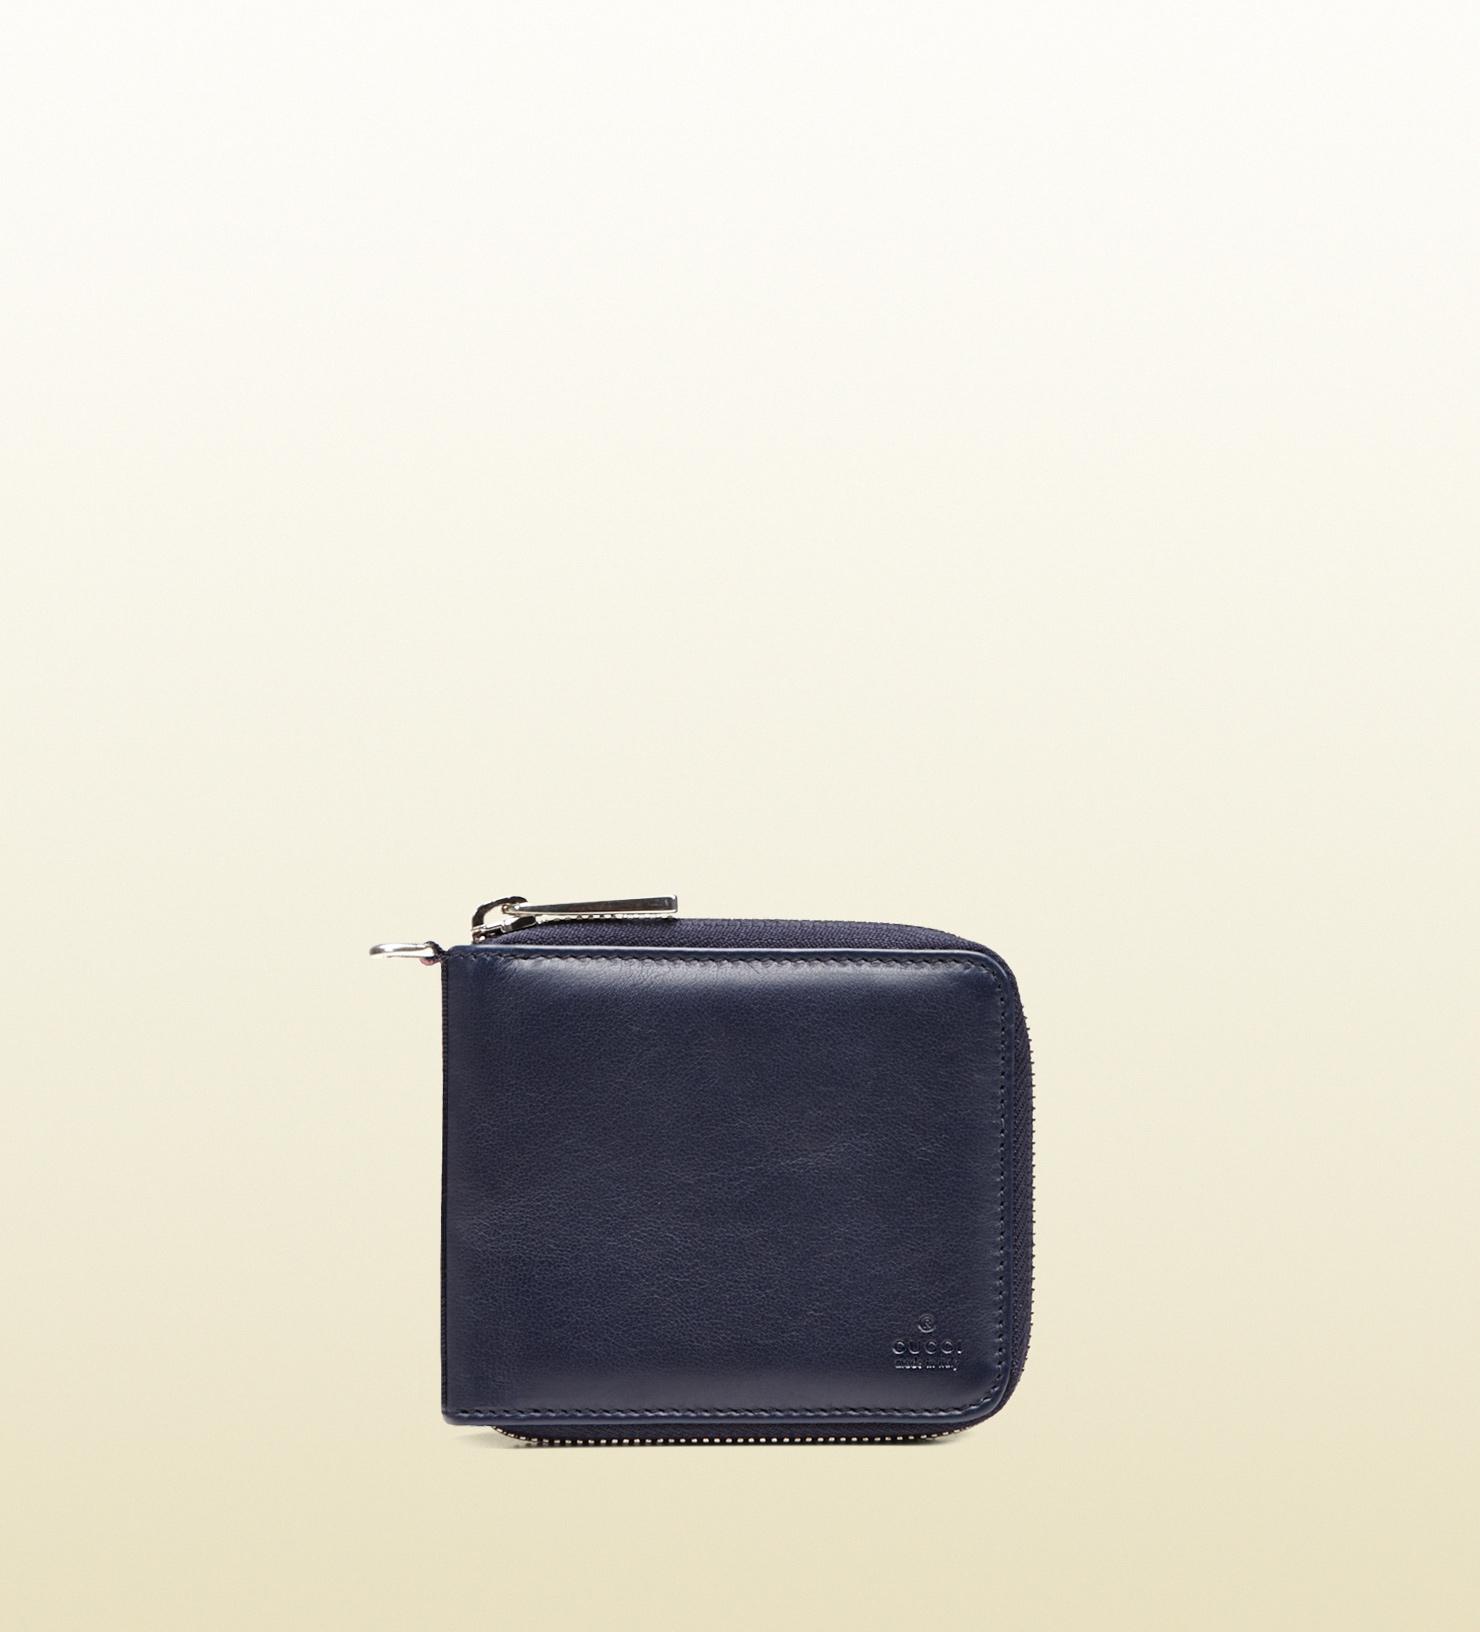 bd0d80e14ac Gucci Mens Wallet Zip Around - Best Photo Wallet Justiceforkenny.Org